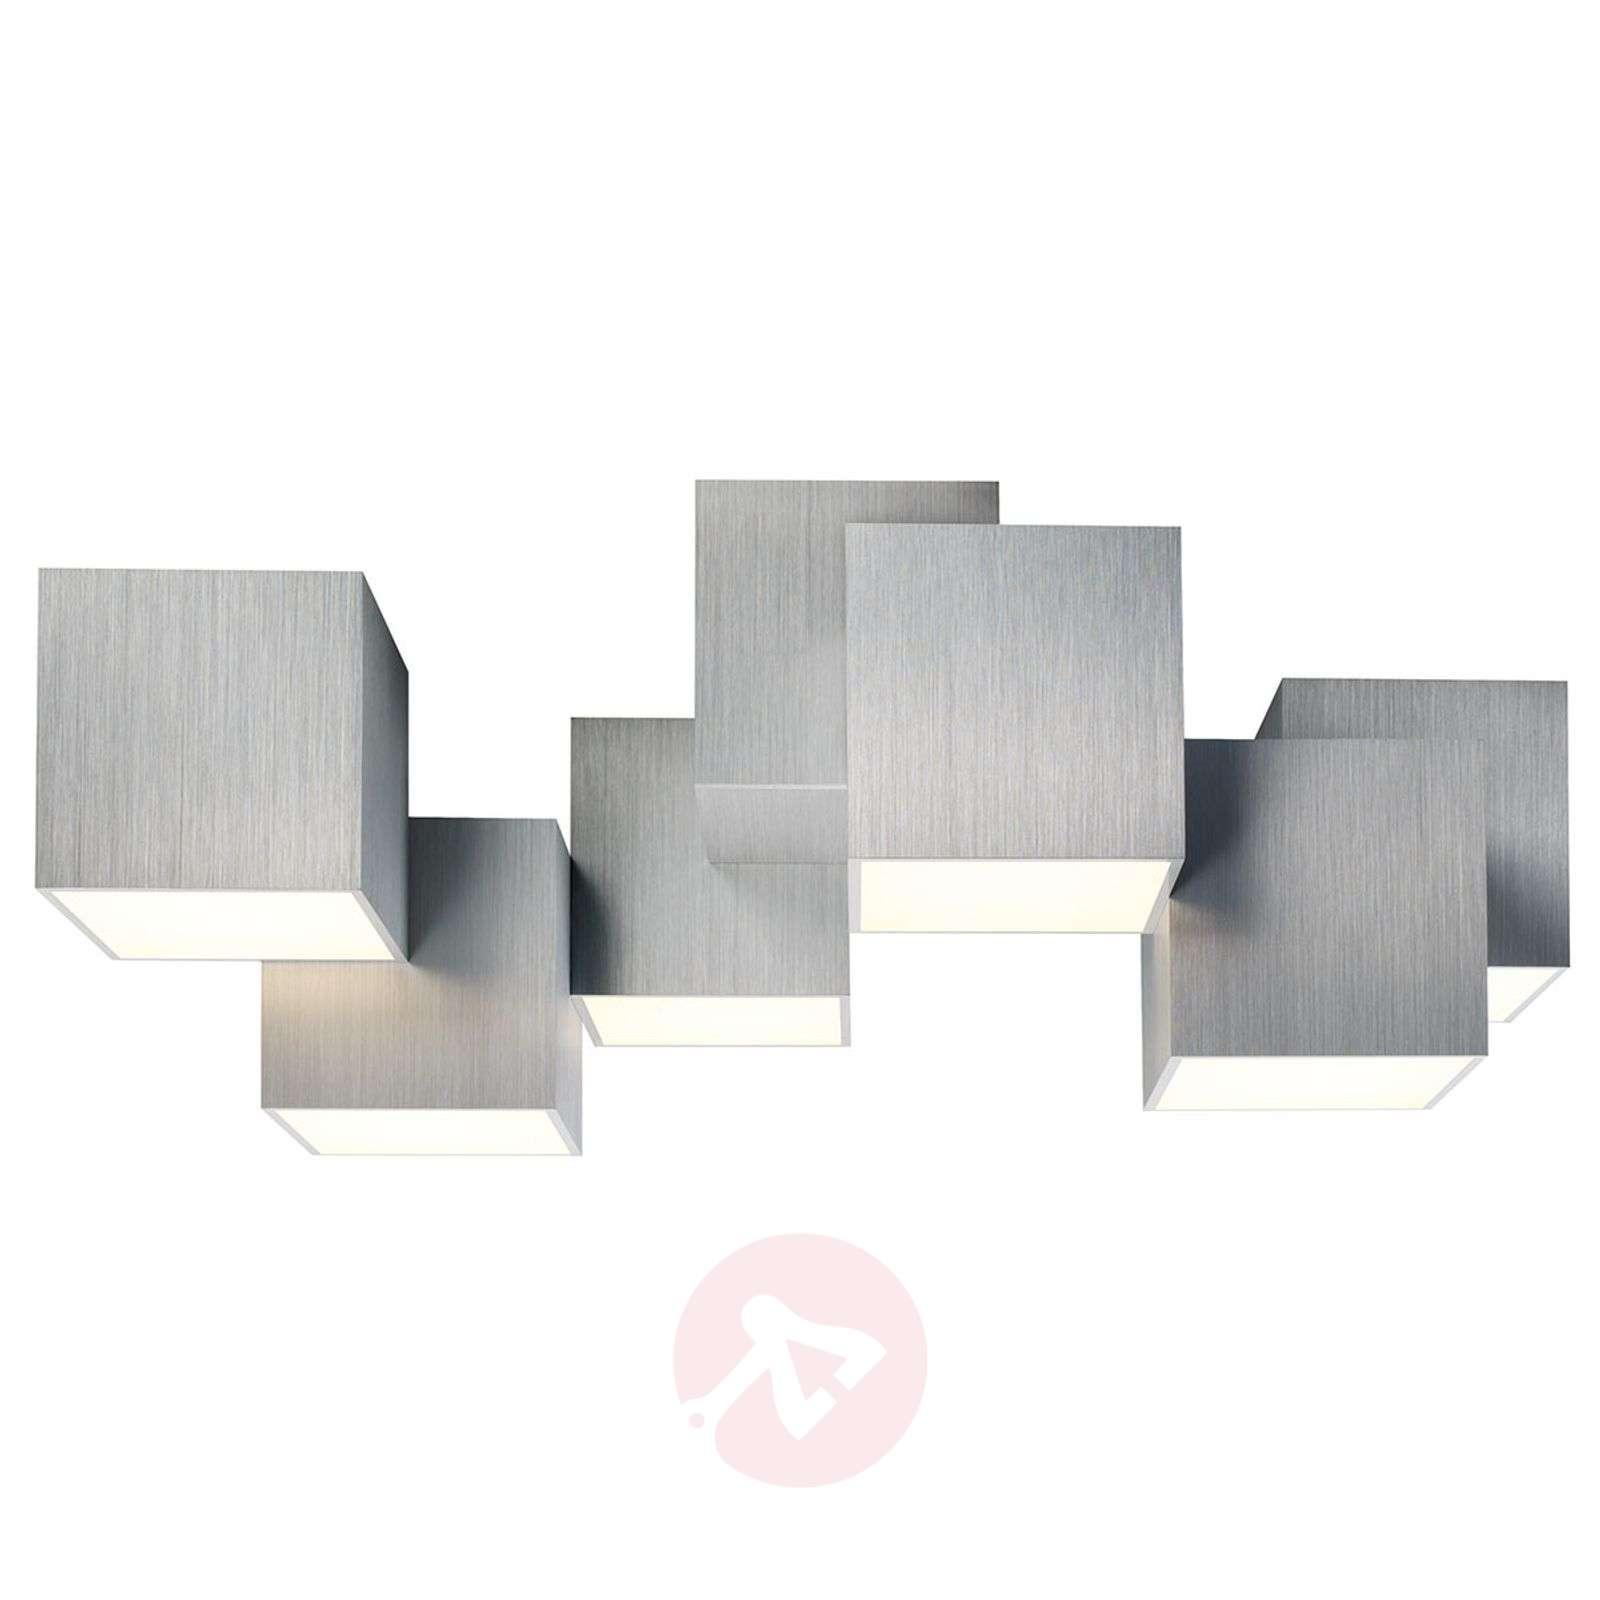 GROSSMANN Rocks LED-kattovalaisin 6-lamppuinen-4022070-01